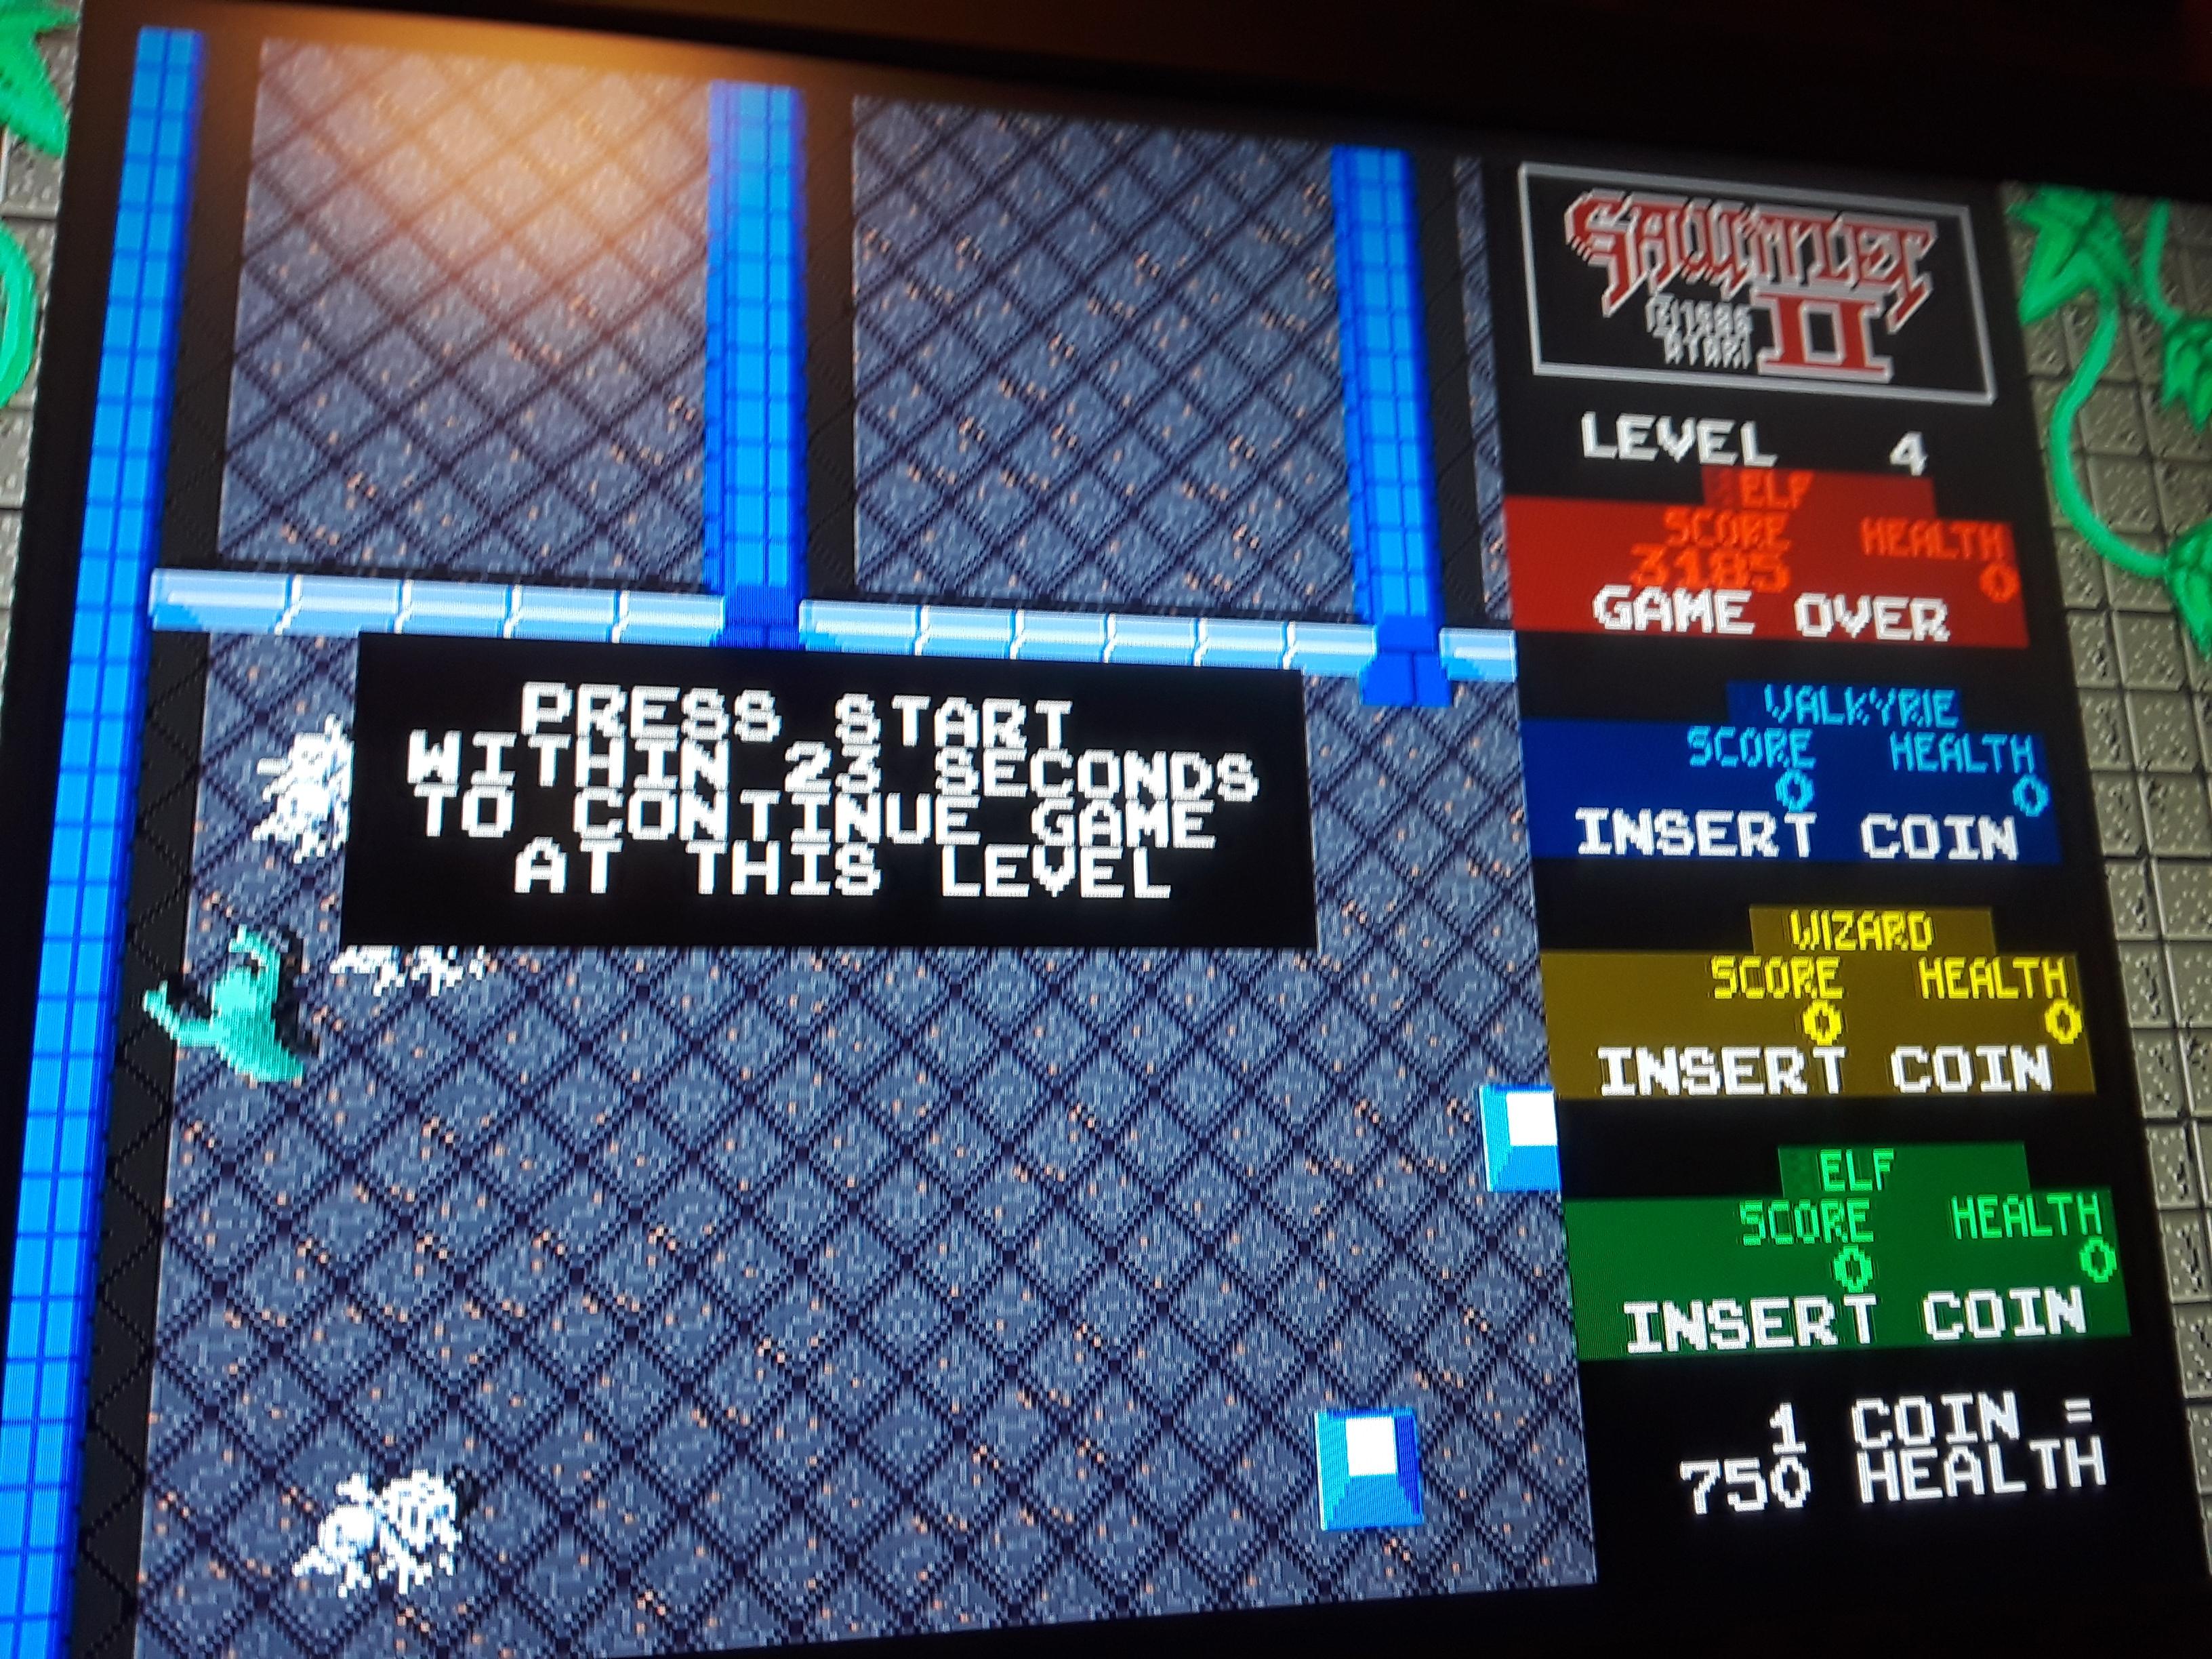 JML101582: Midway Arcade Origins: Gauntlet 2 [Medium] (Playstation 3) 3,185 points on 2018-09-19 22:57:27